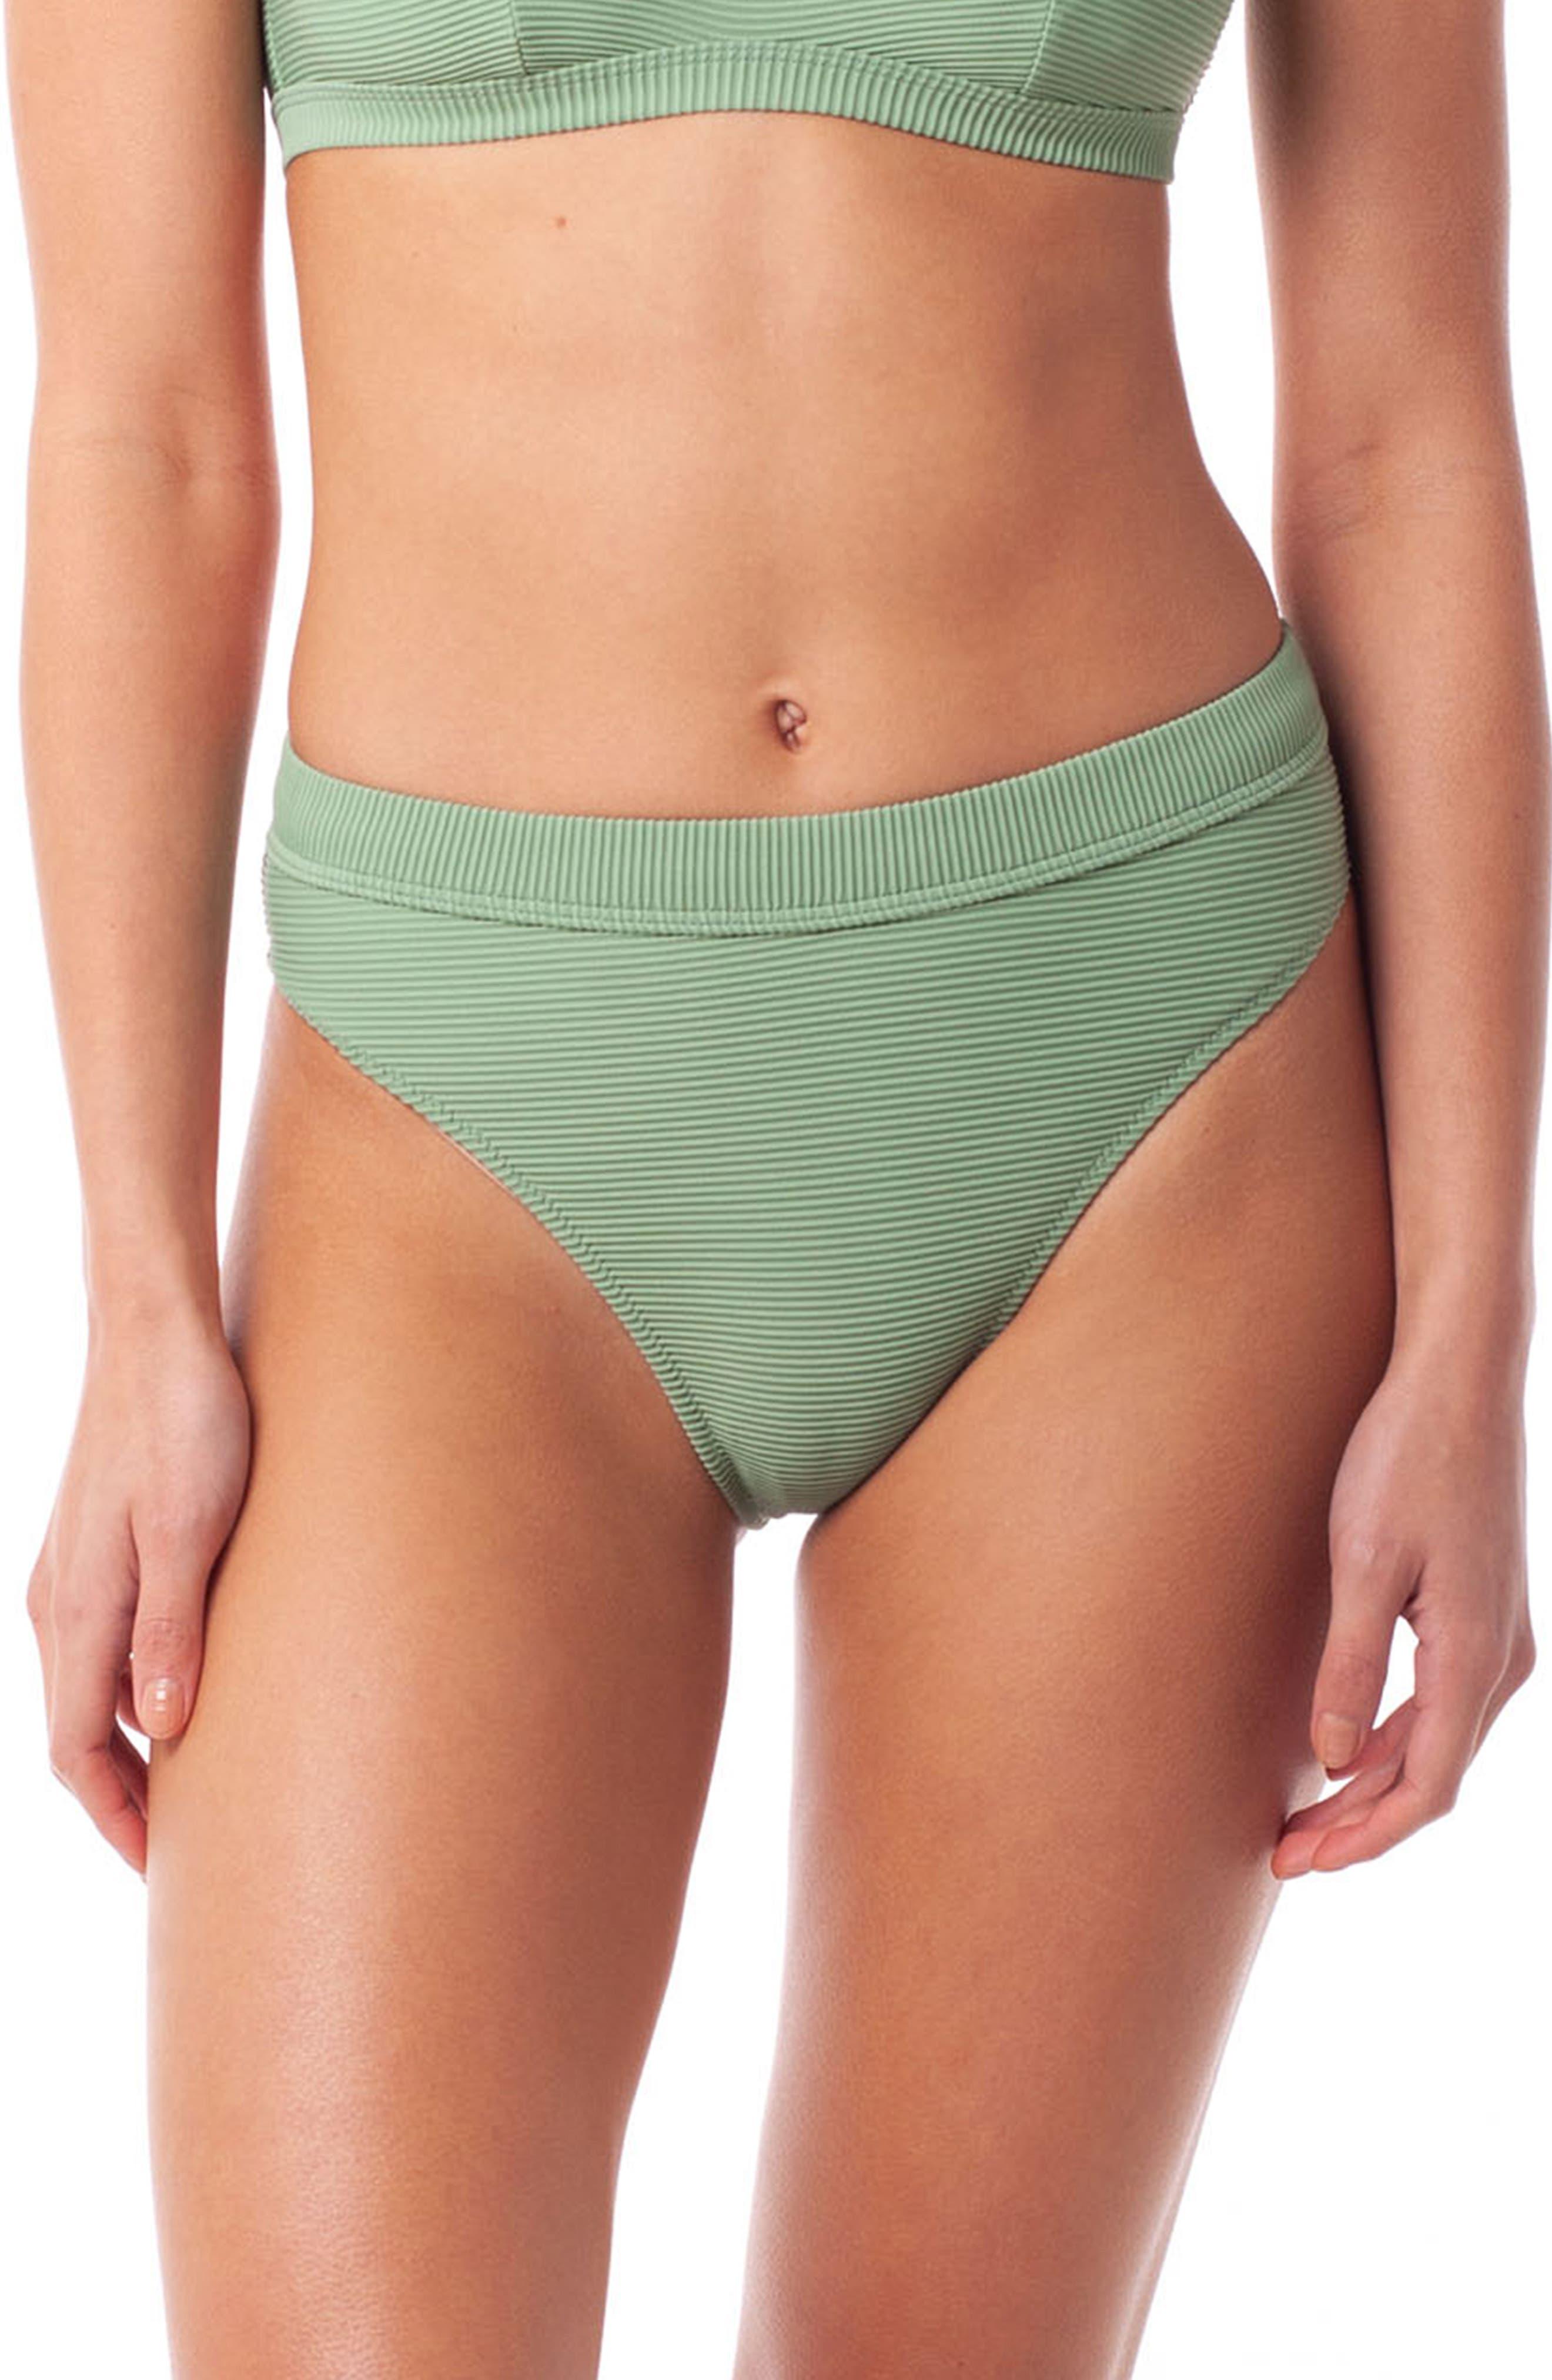 Rhythm Palm Springs Xanadu Bikini Bottoms